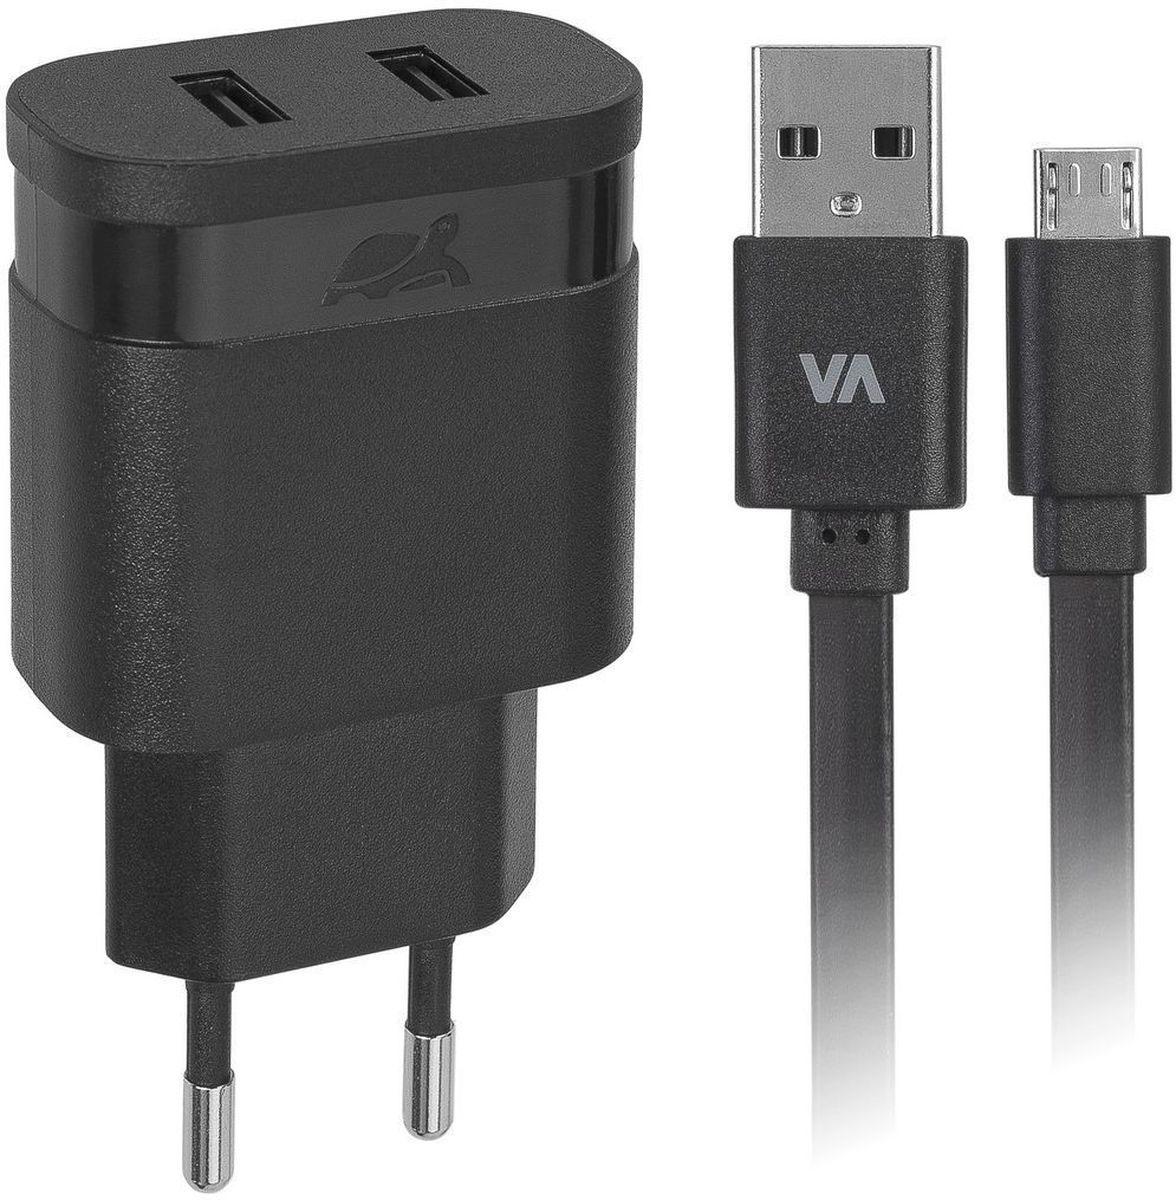 Rivapower VA4122 BD1, Black сетевое зарядное устройство